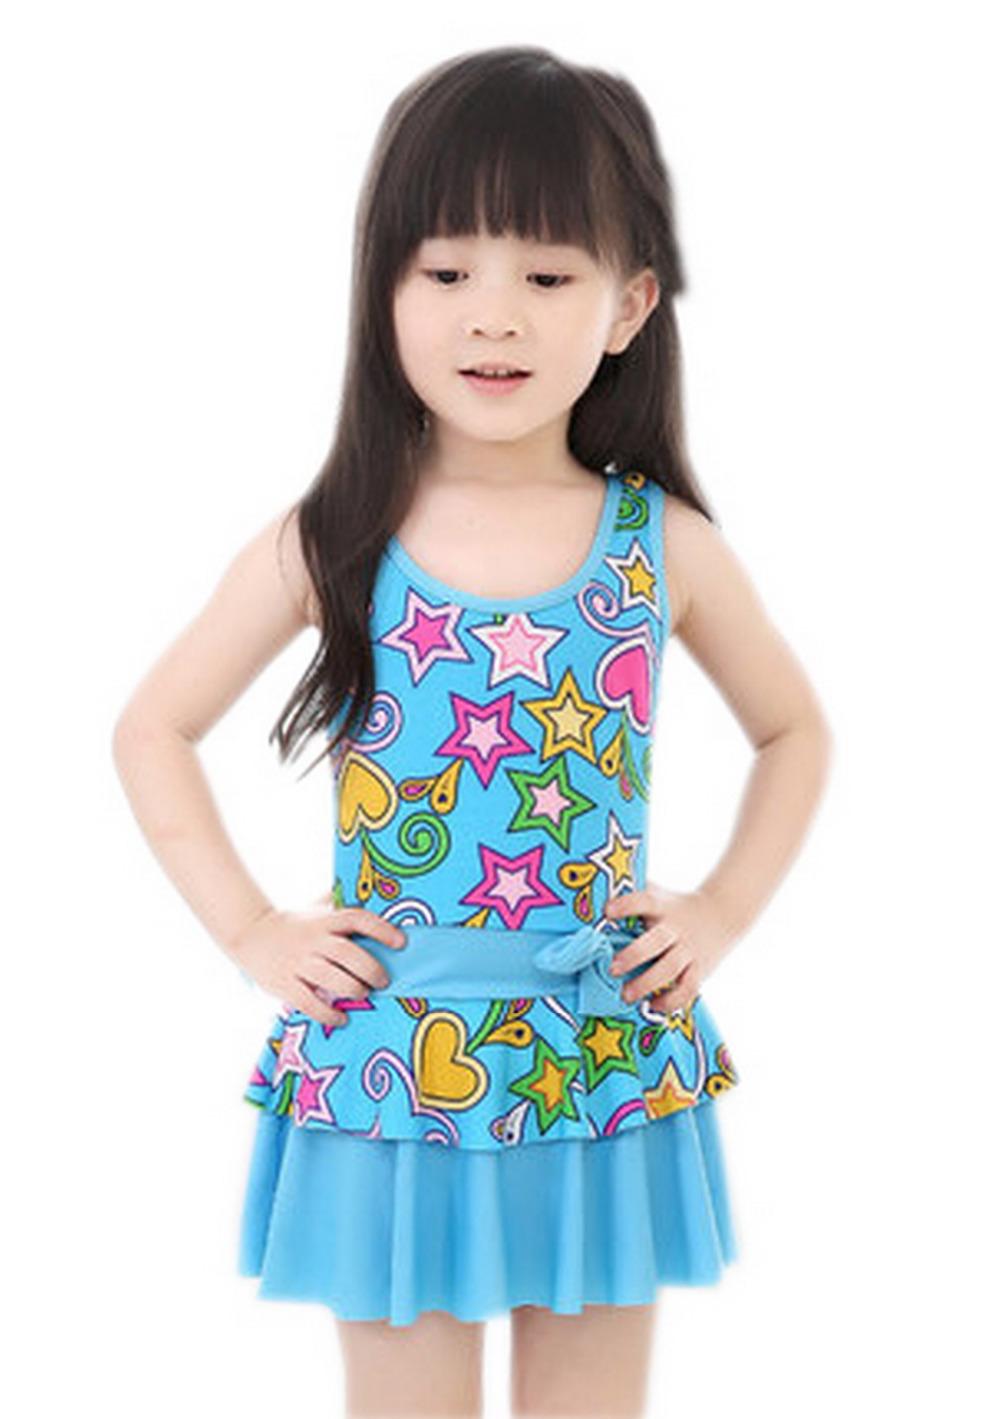 9b807bb5a207a تشكيلة ملابس أطفال صيفية للبنات · تشكيلة ملابس أطفال صيفية للبنات ...